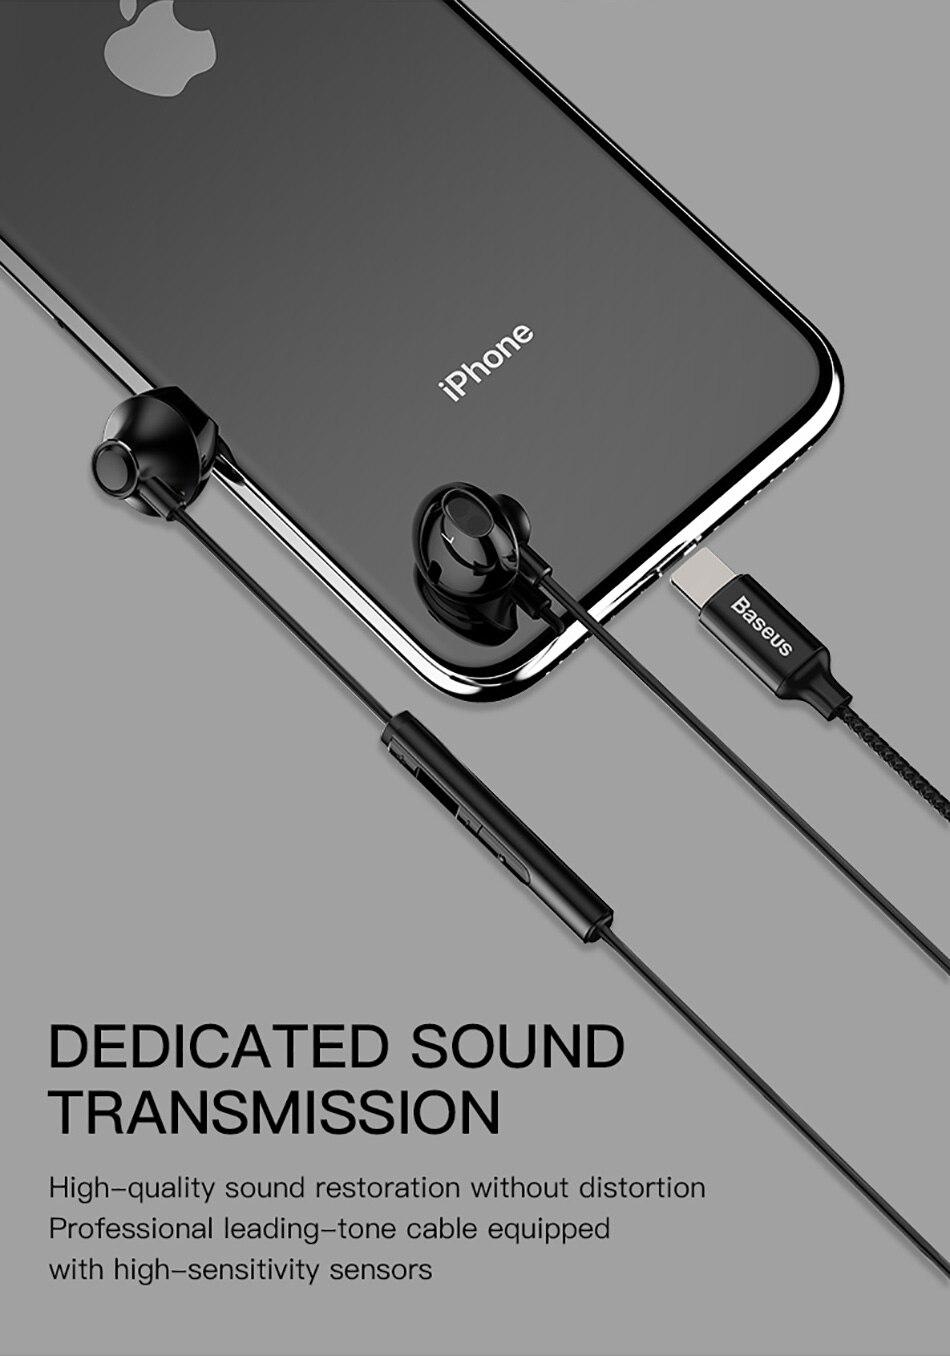 Baseus P06 Wired Stereo Earphone For iPhone X 8 7 Bass Sound Hifi ... cc6938827b296